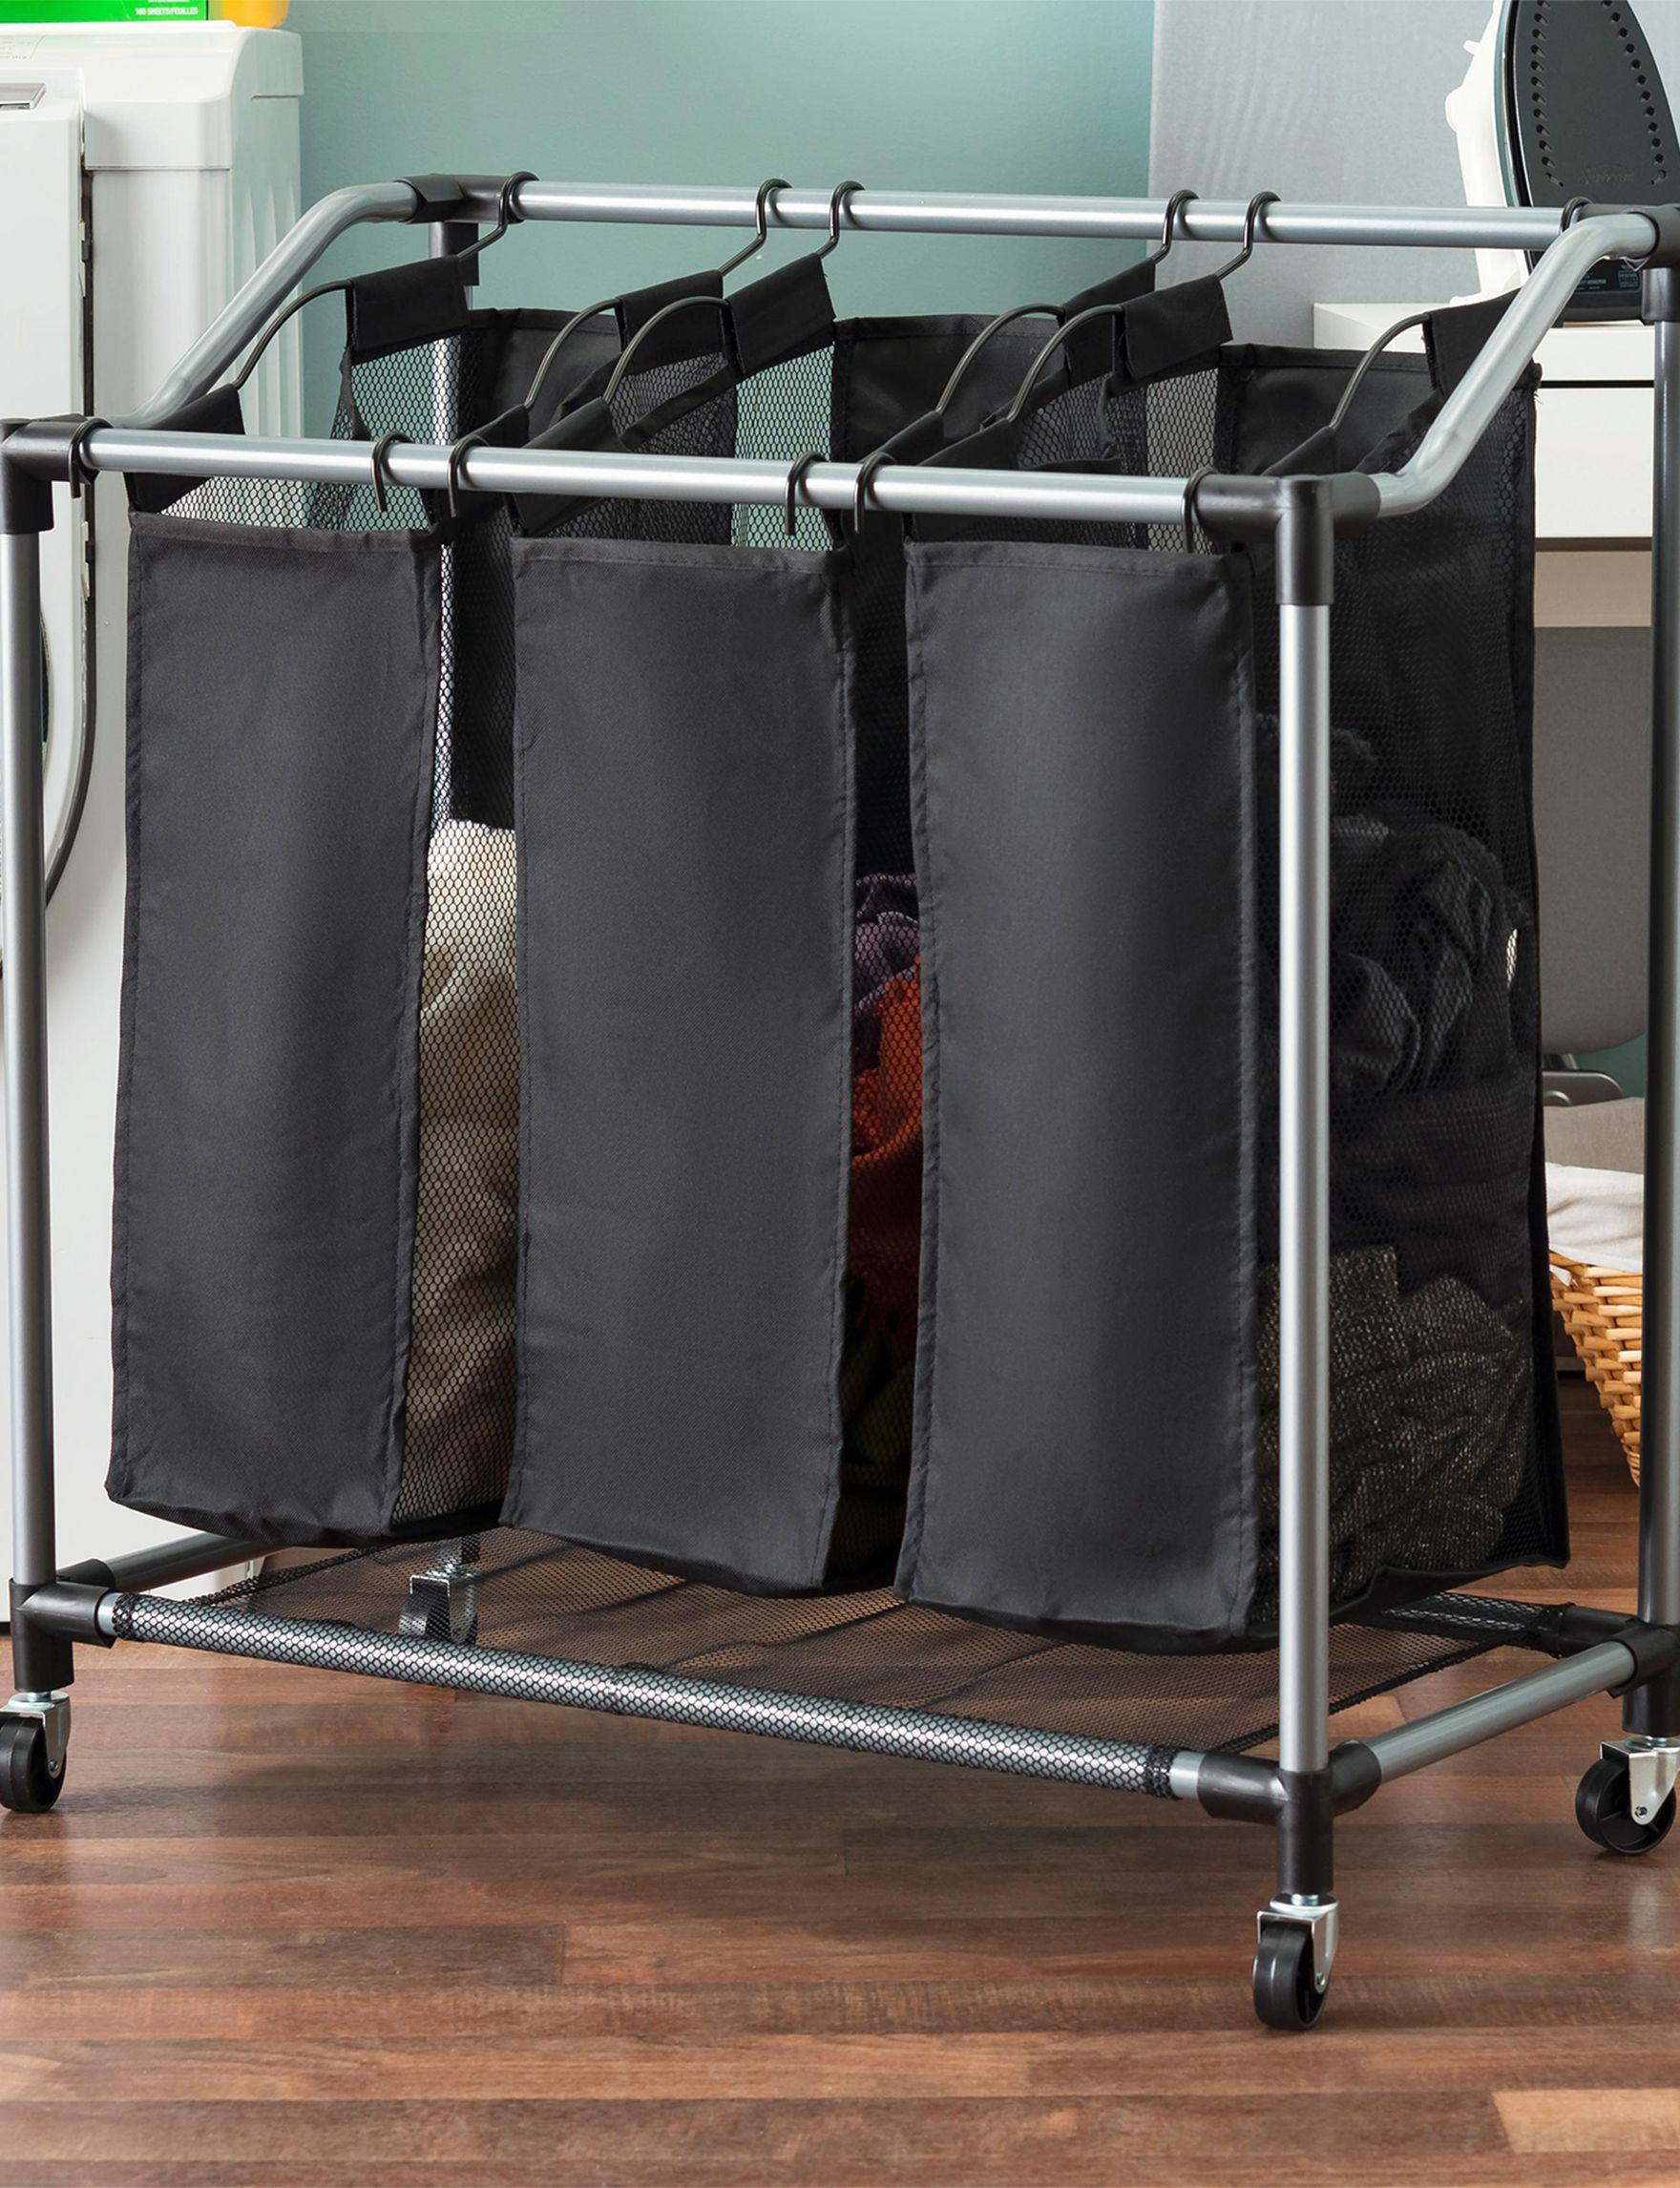 Home Basics Black Irons & Clothing Care